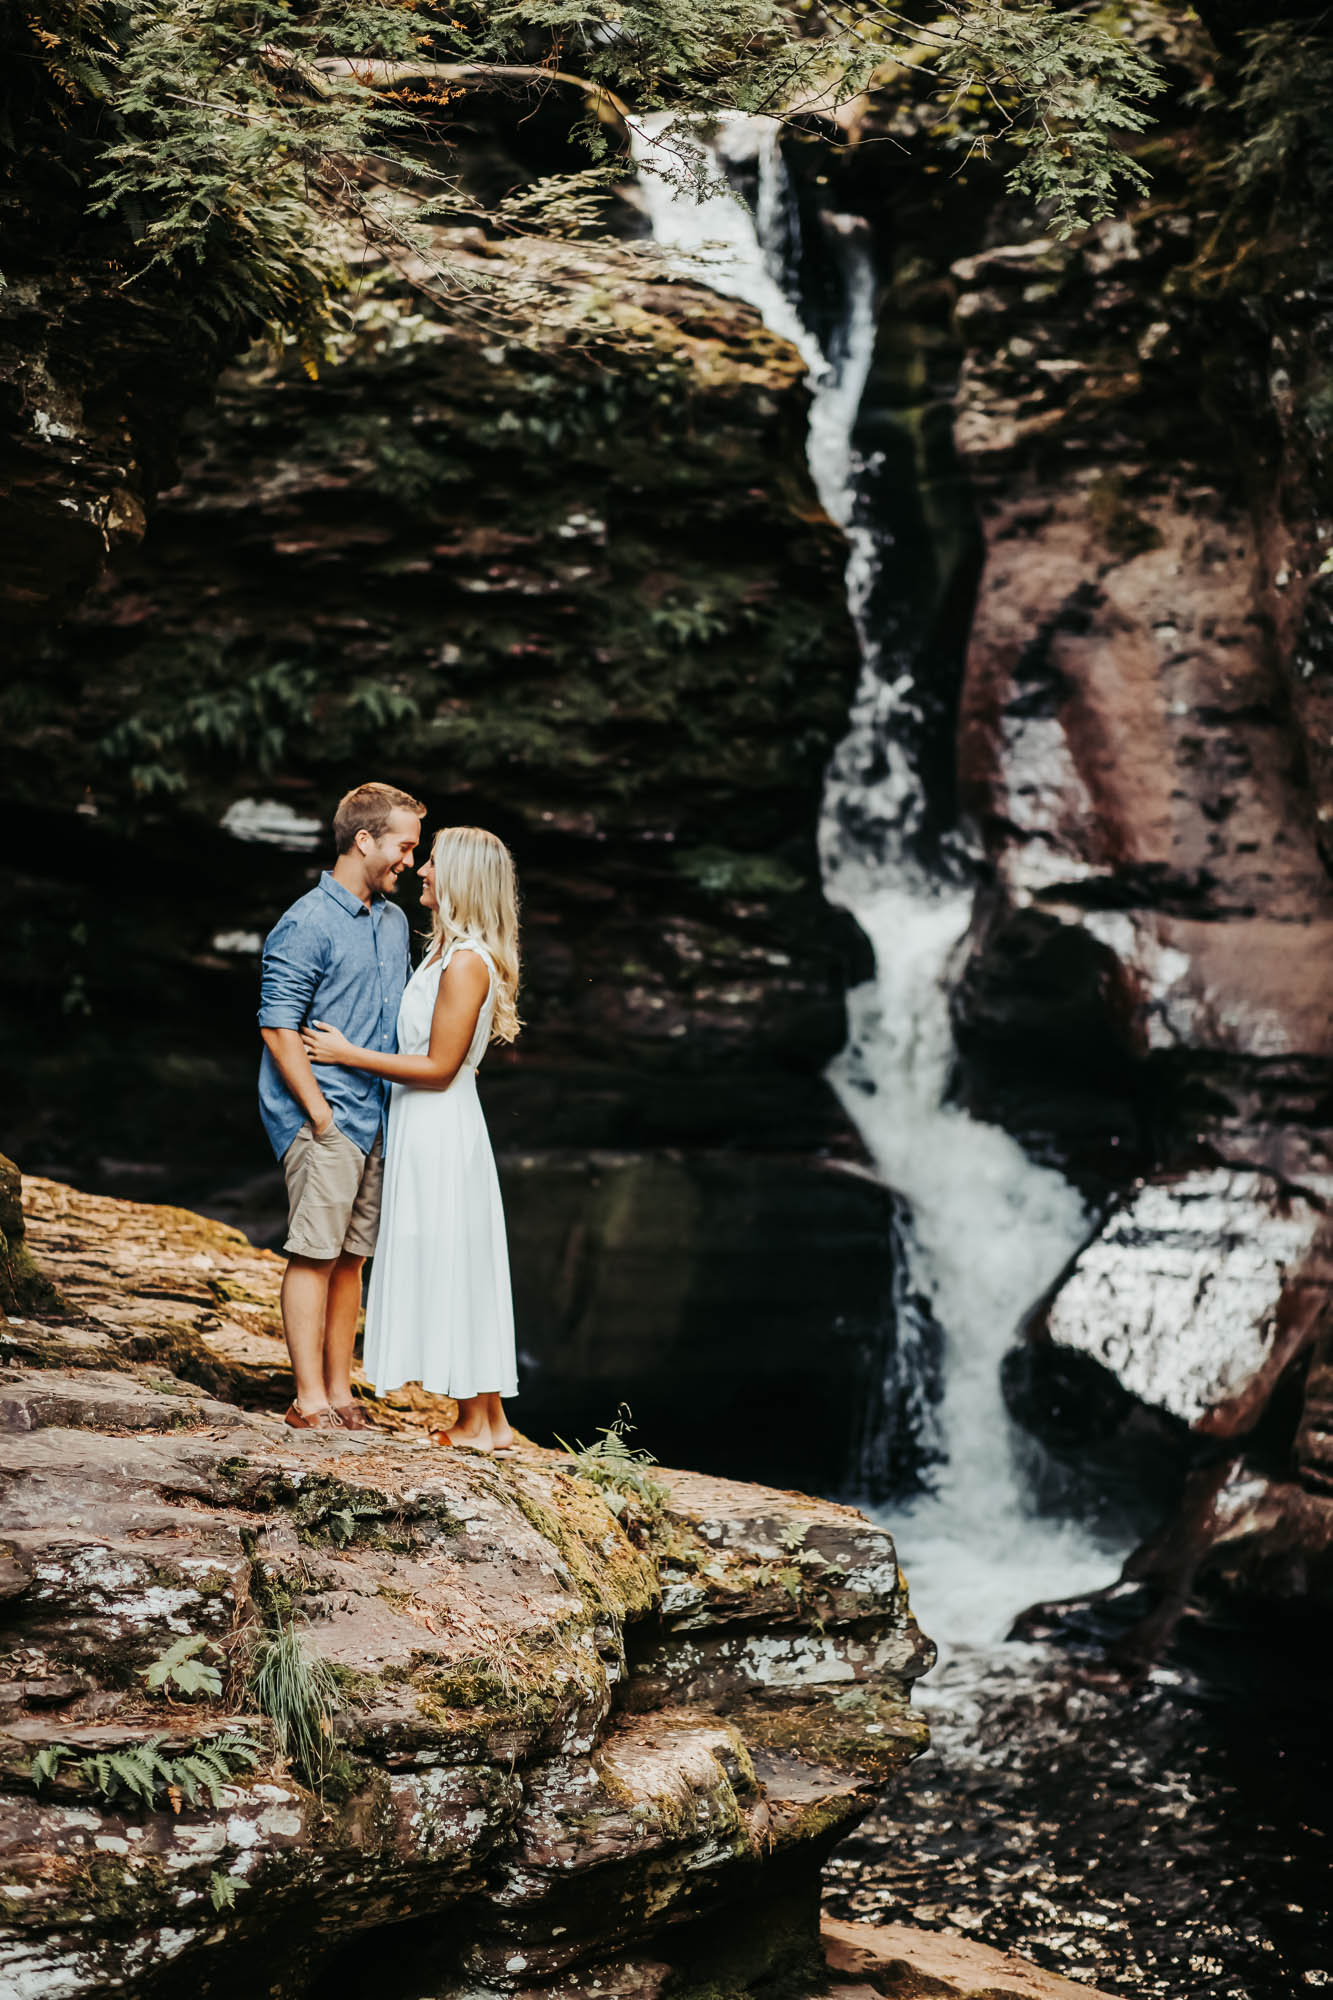 Ricketts-Glen-fall-engagement-photos-2541.jpg